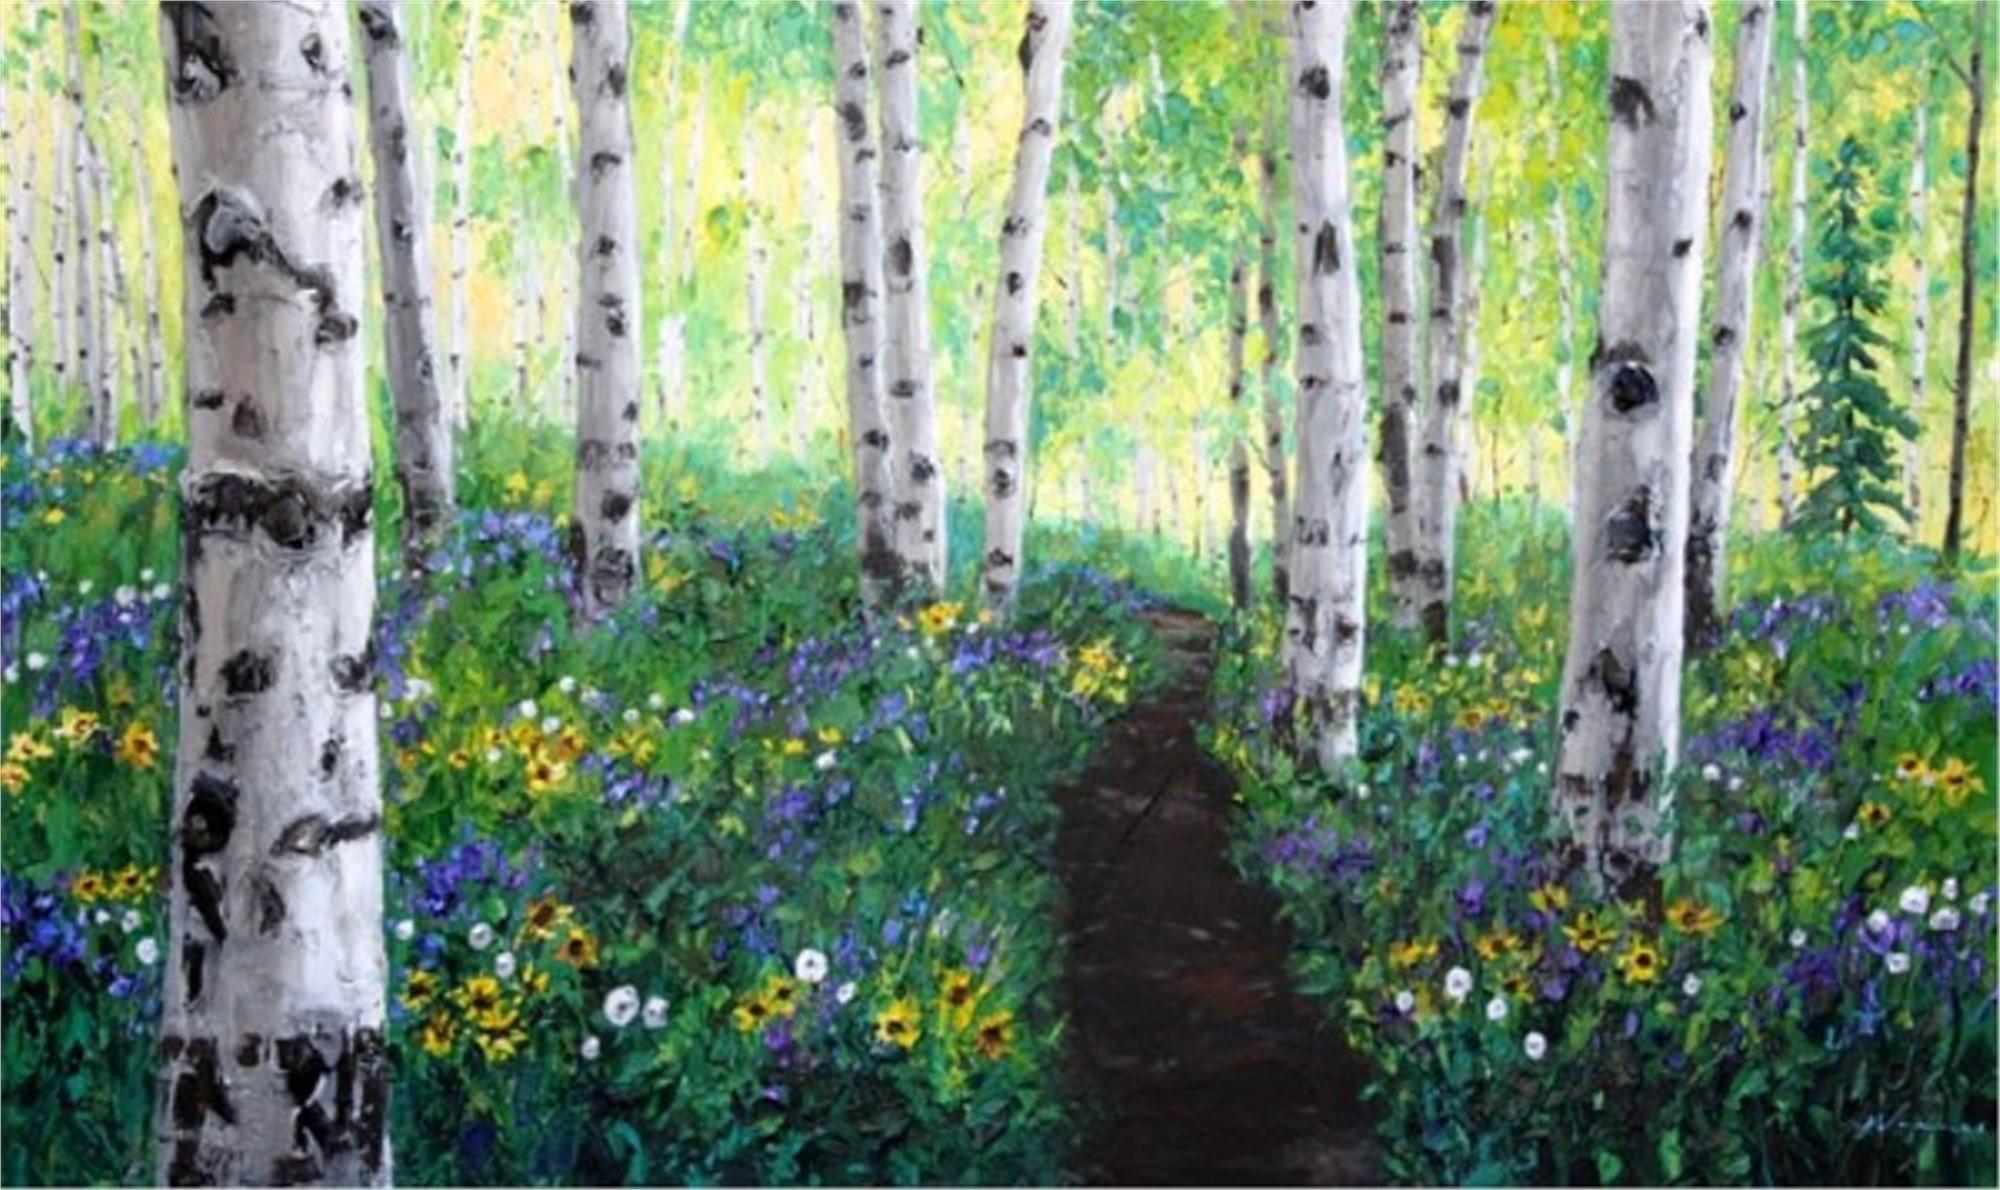 Spring Bliss by Jennifer Vranes